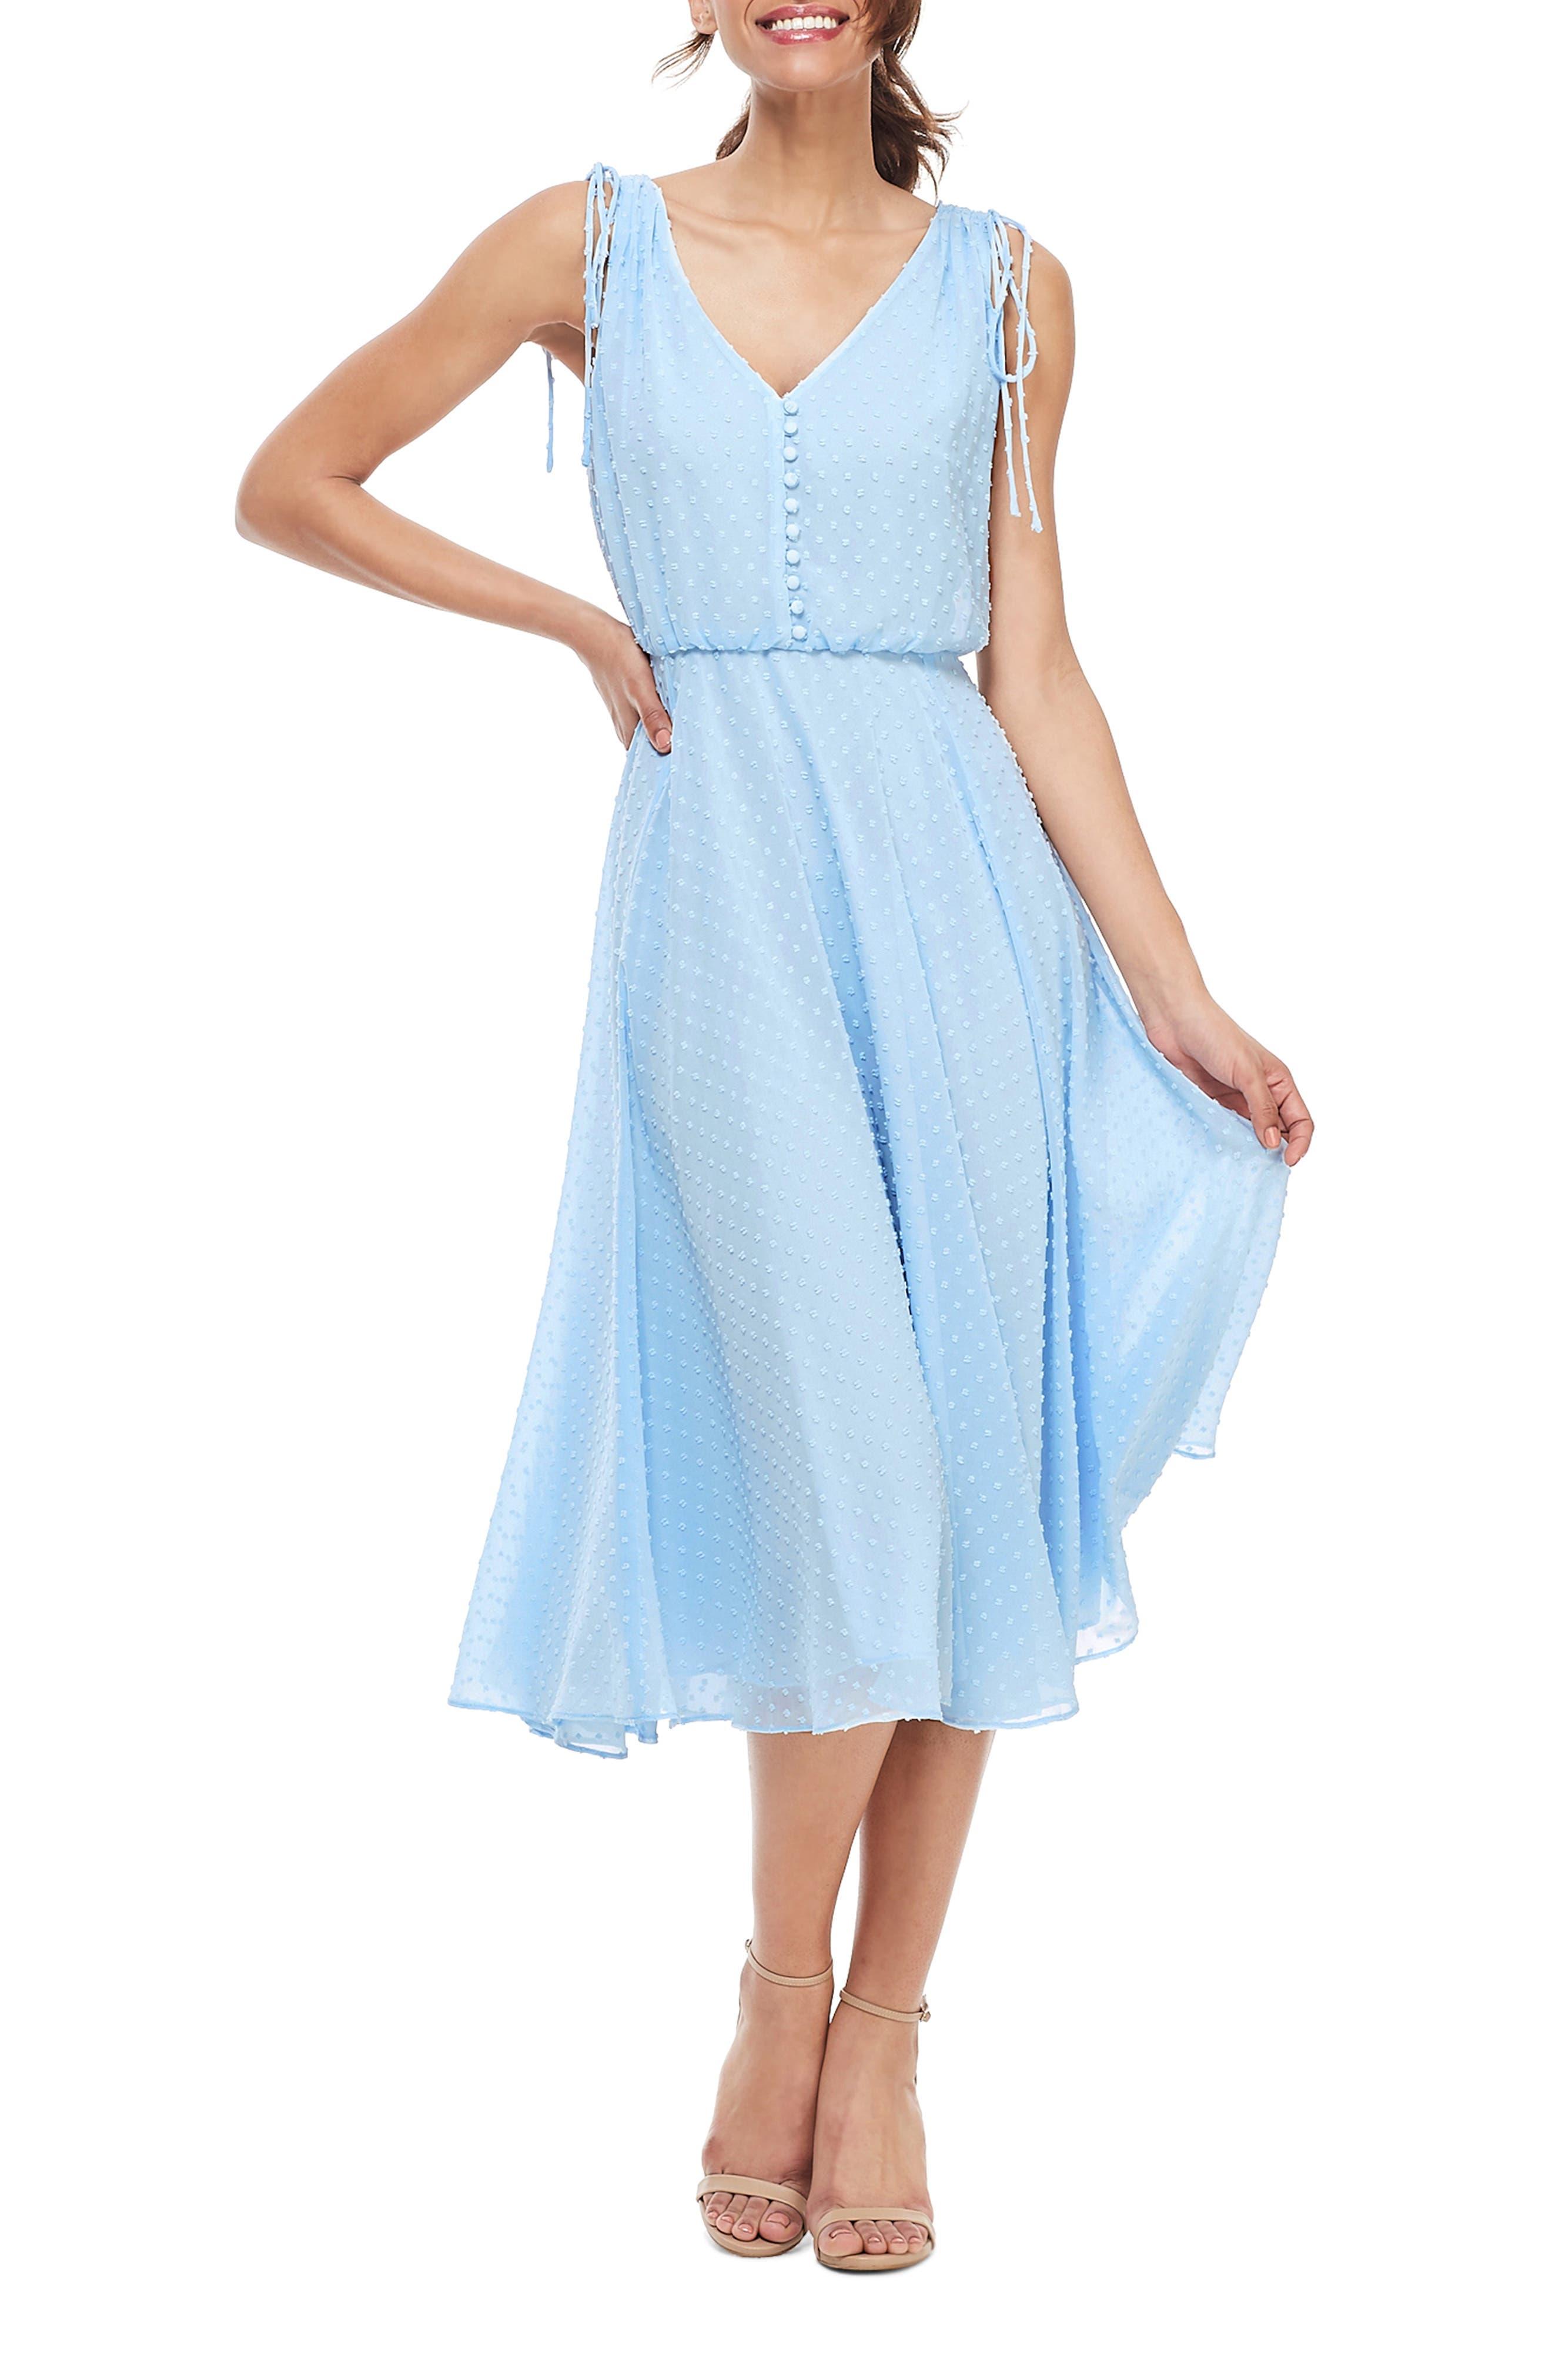 Gal Meets Glam Collection Hilary Clip Dot Chiffon Midi Dress, 8 (similar to 1) - Blue